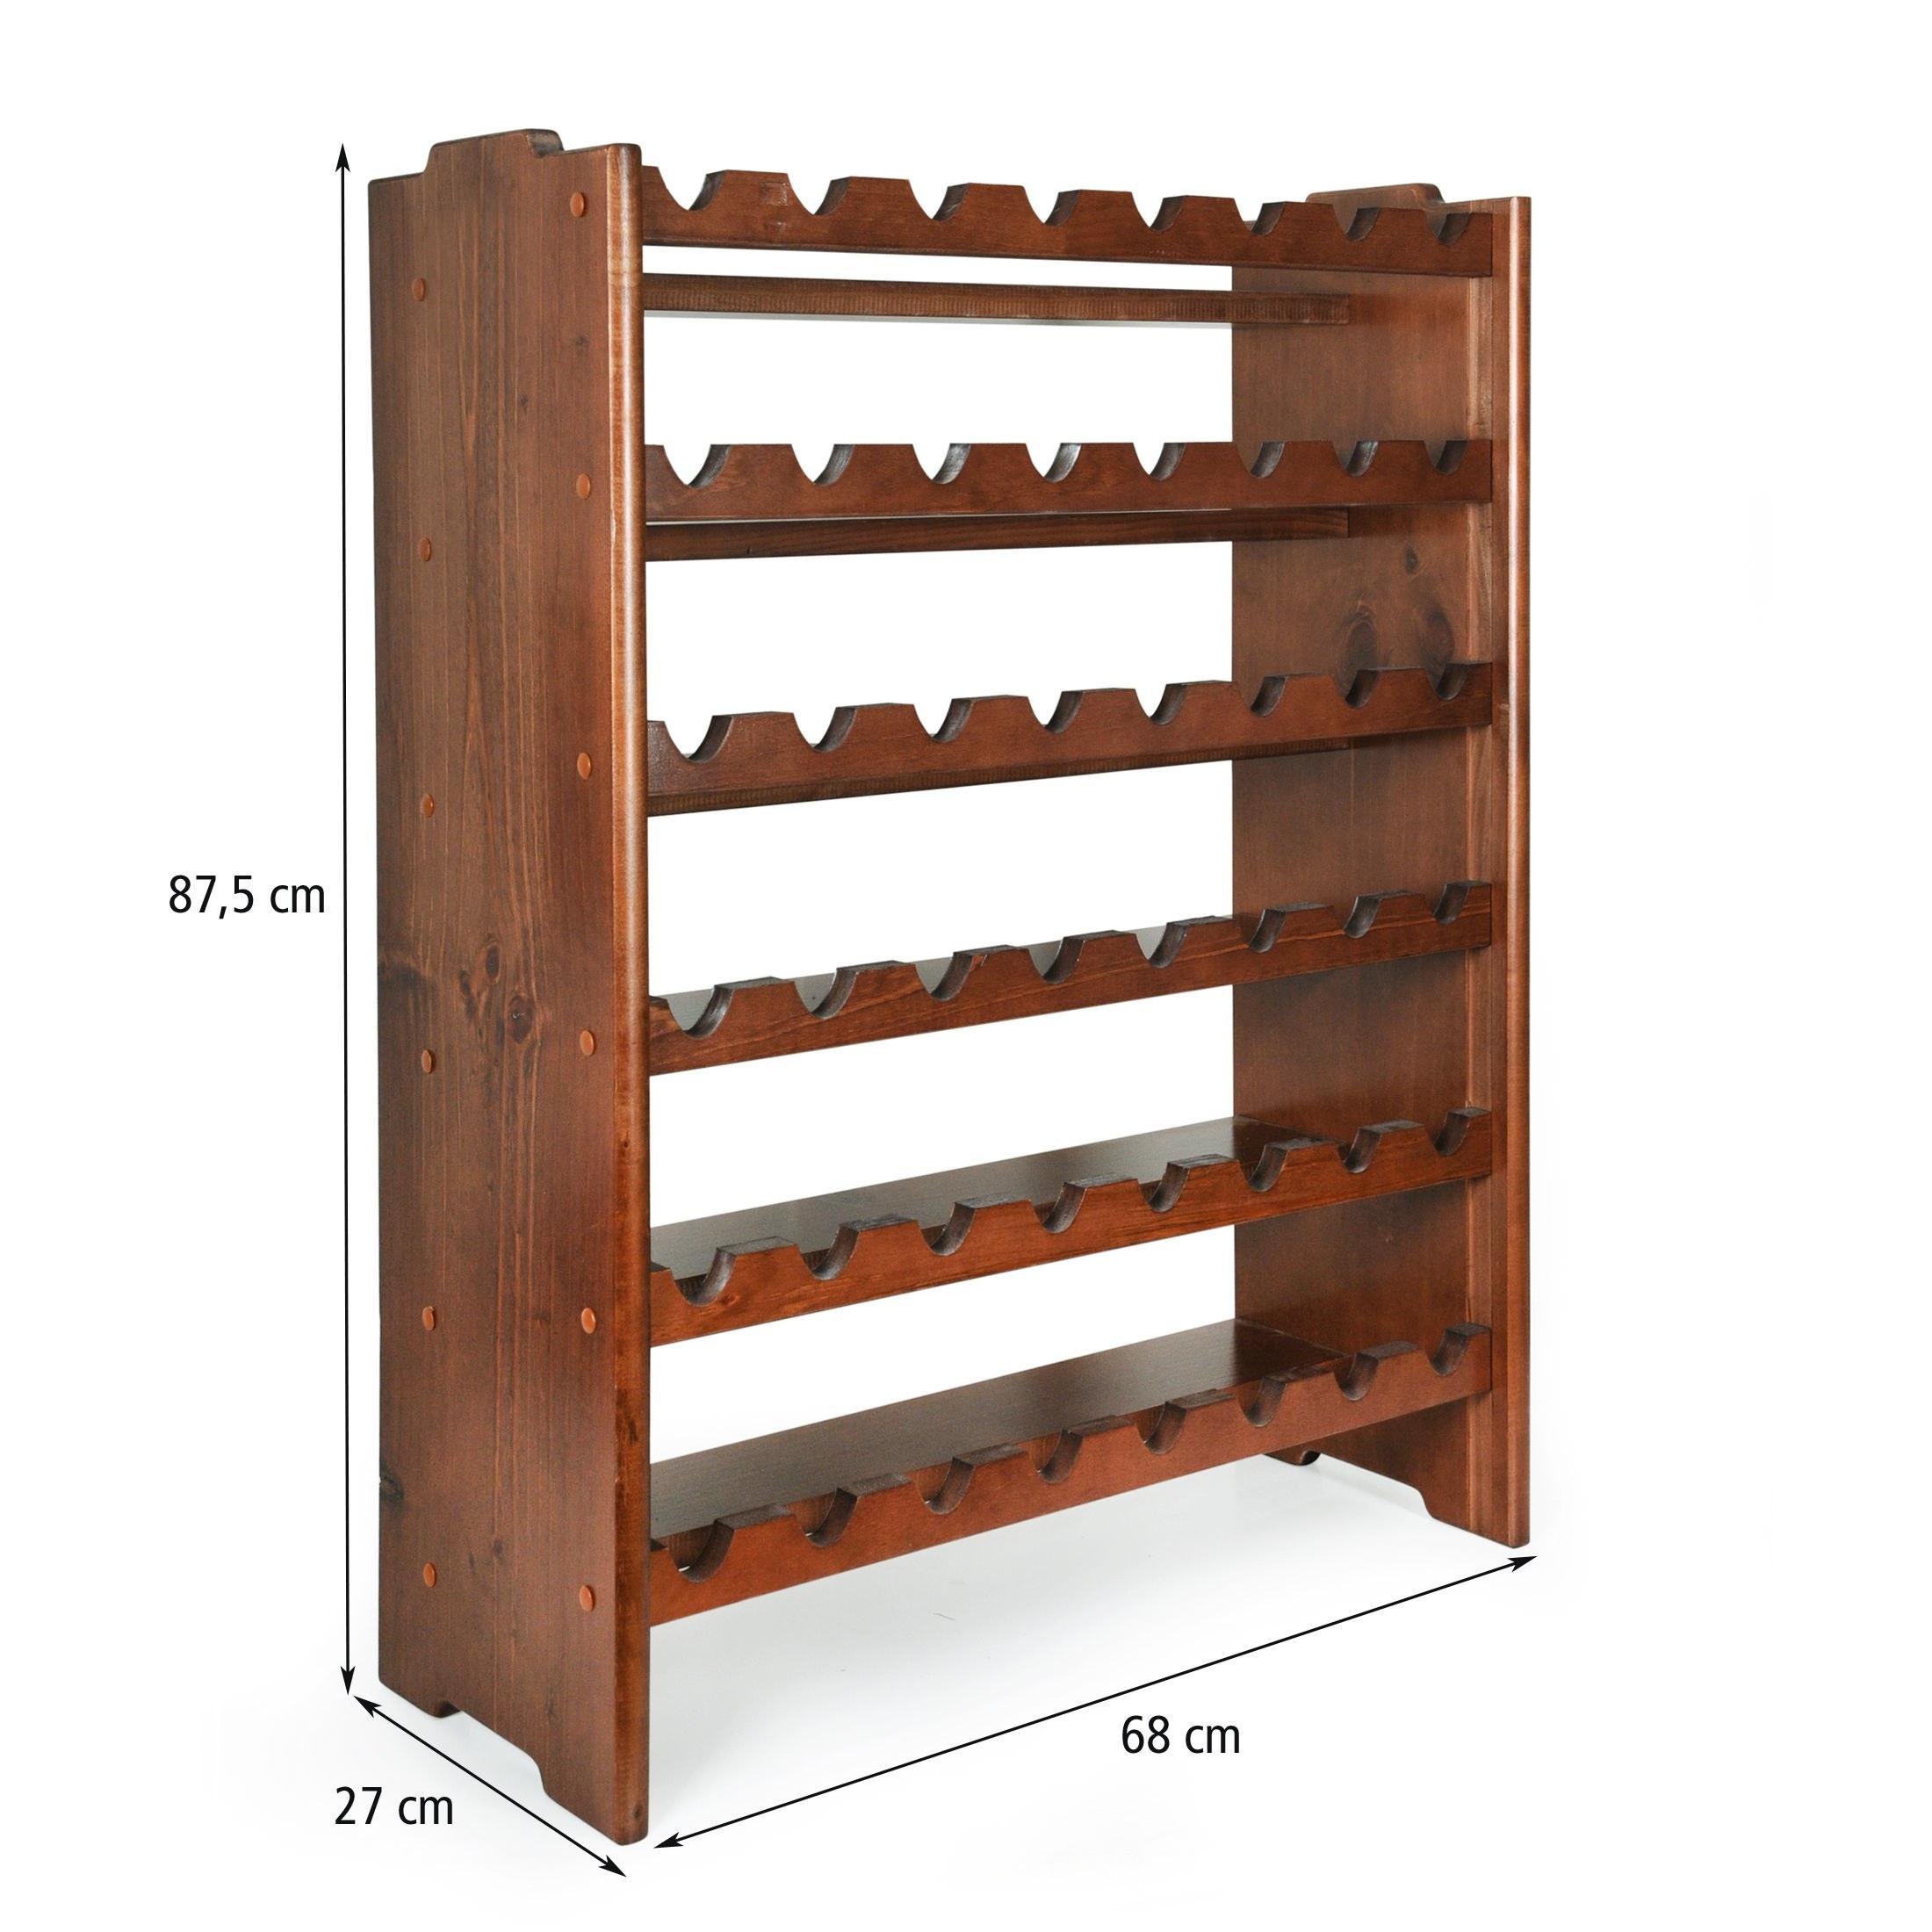 weinregal system medoc holz kiefer dunkelbraun stapelbar erweiterbar ebay. Black Bedroom Furniture Sets. Home Design Ideas